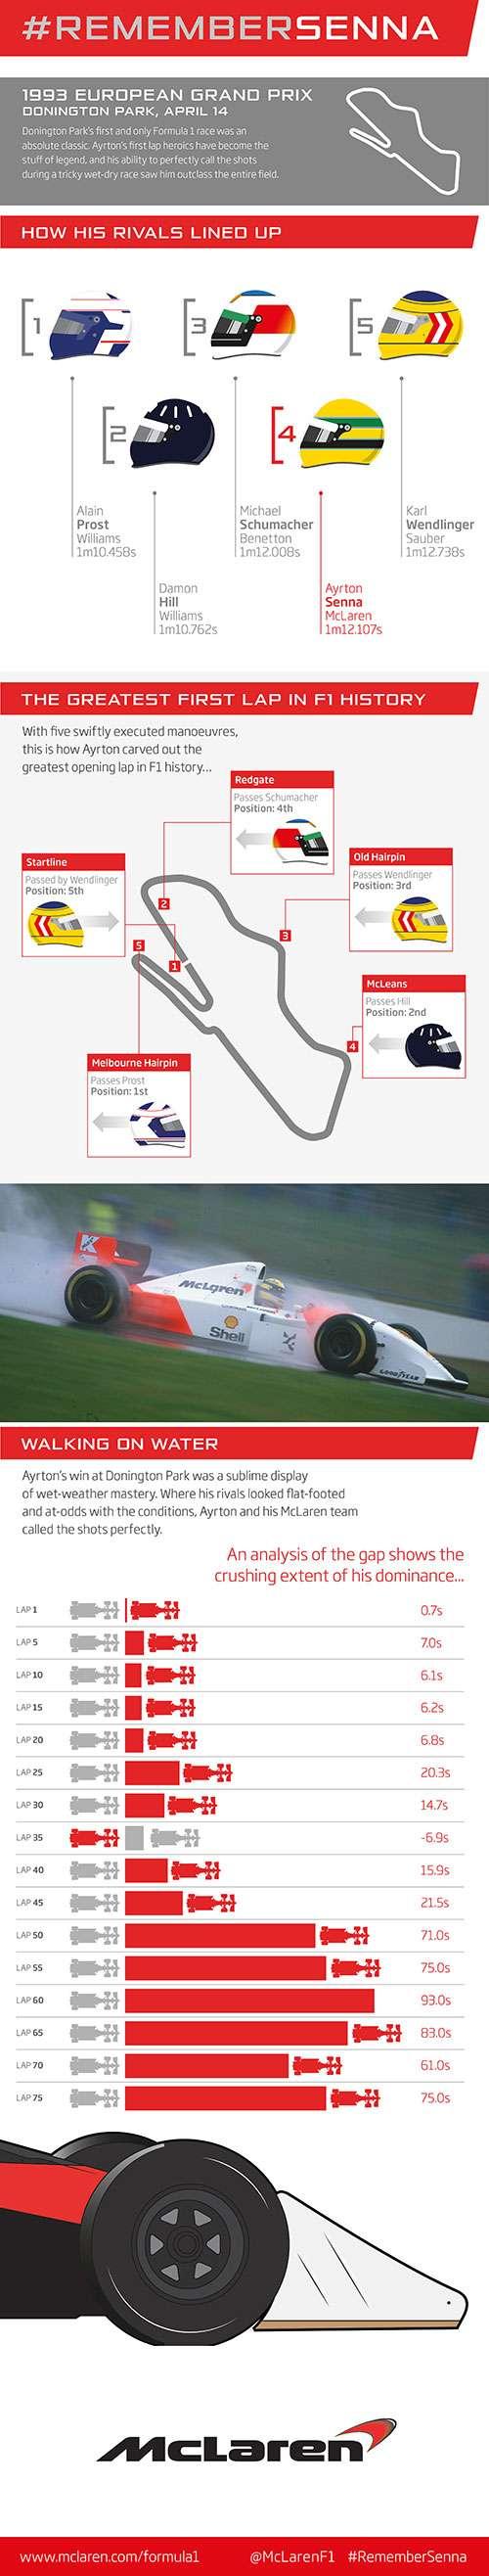 F1 1993 European GP Ayrton Senna First Lap Infographic